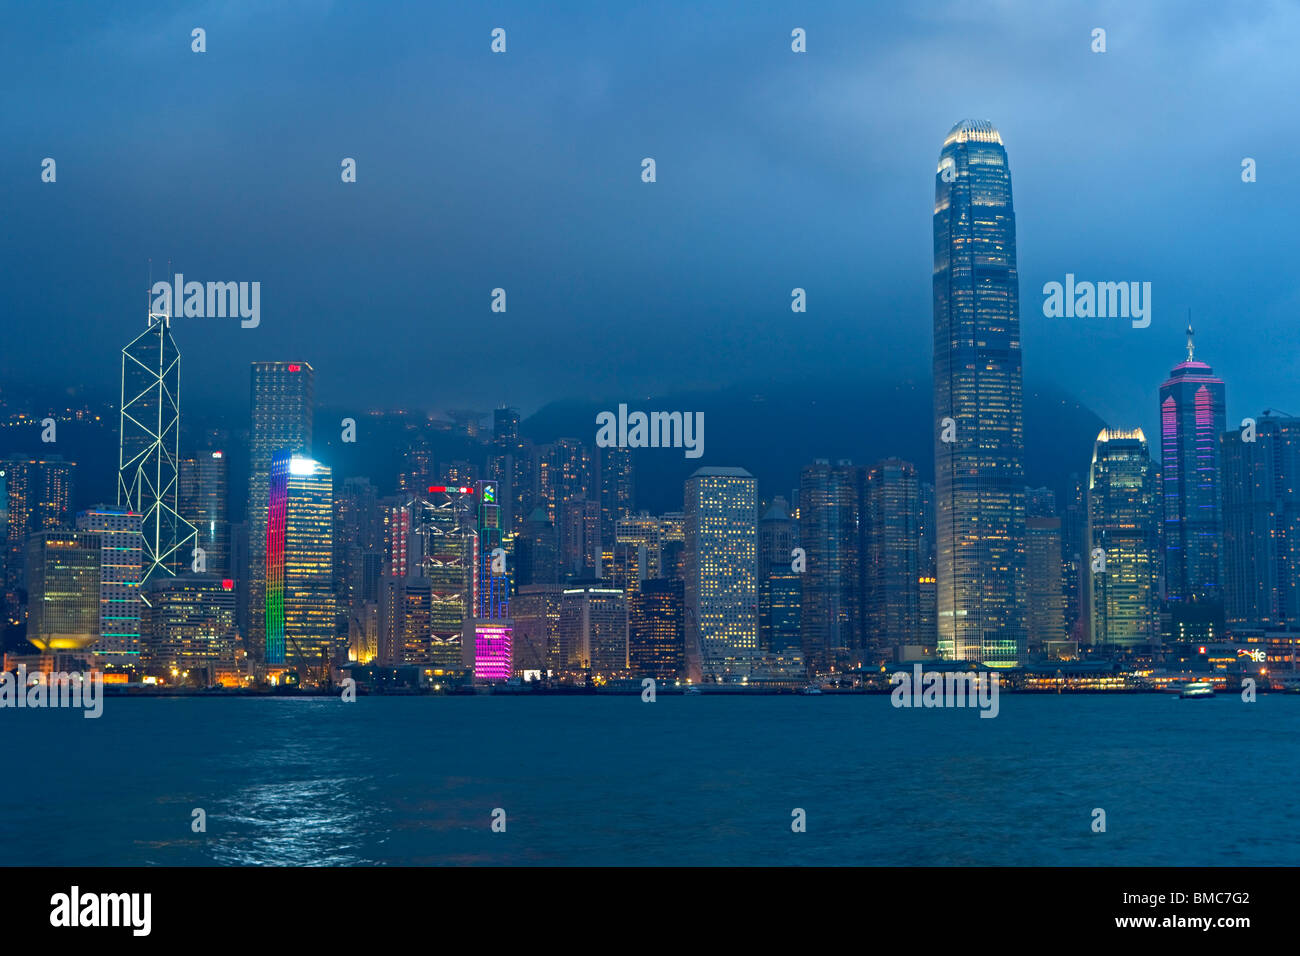 Central Business District, Hong Kong, SAR of China - Stock Image